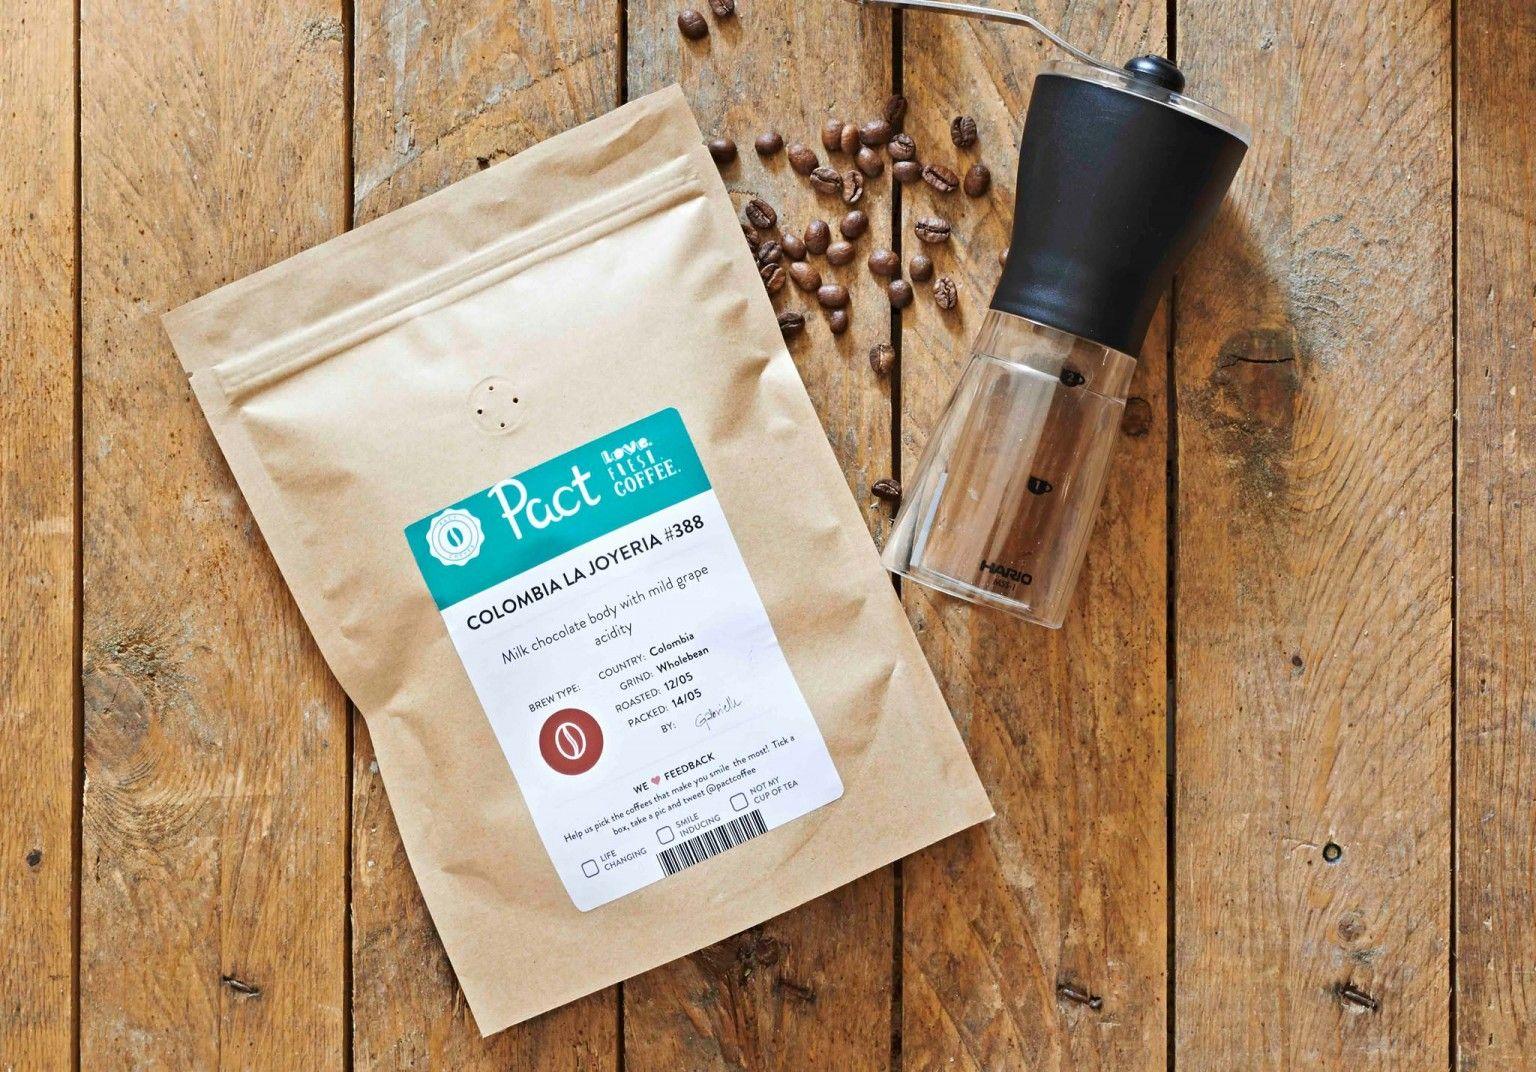 Pact Coffee november 2014 Pact coffee, Coffee gifts